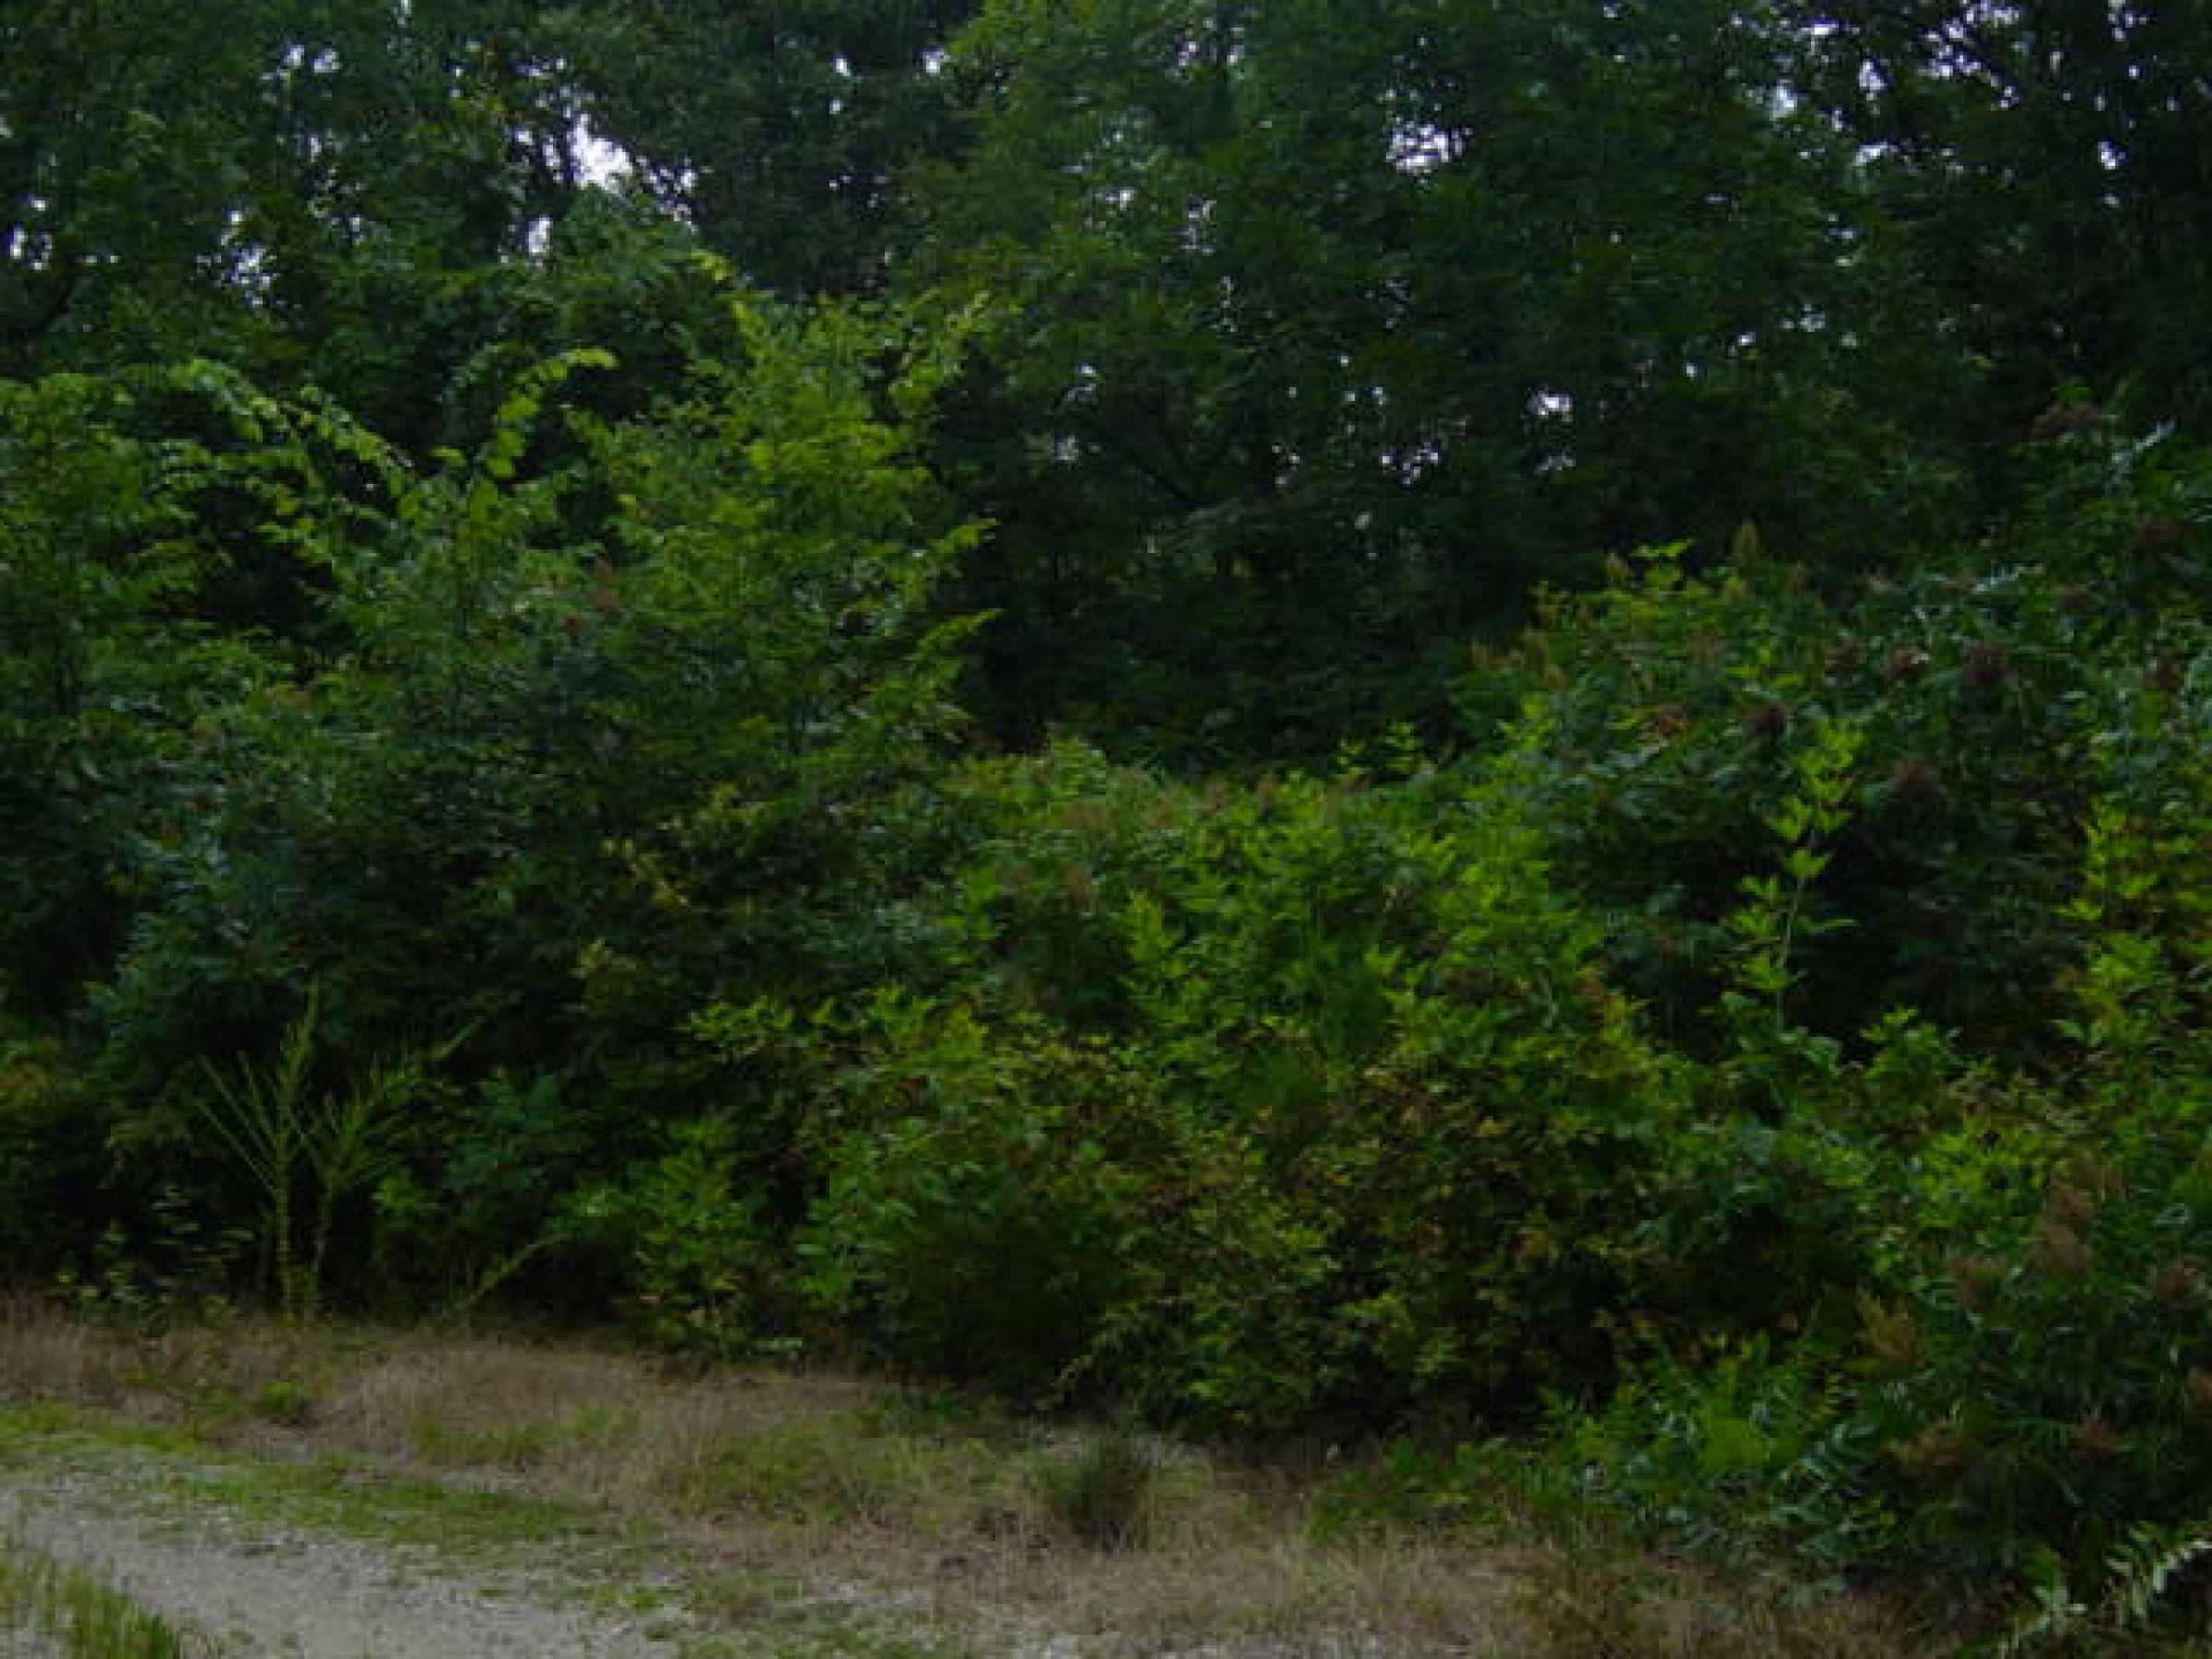 land-sharp-county-arkansas-200-acres-listing-number-15024-0-2020-06-10-145902.JPG